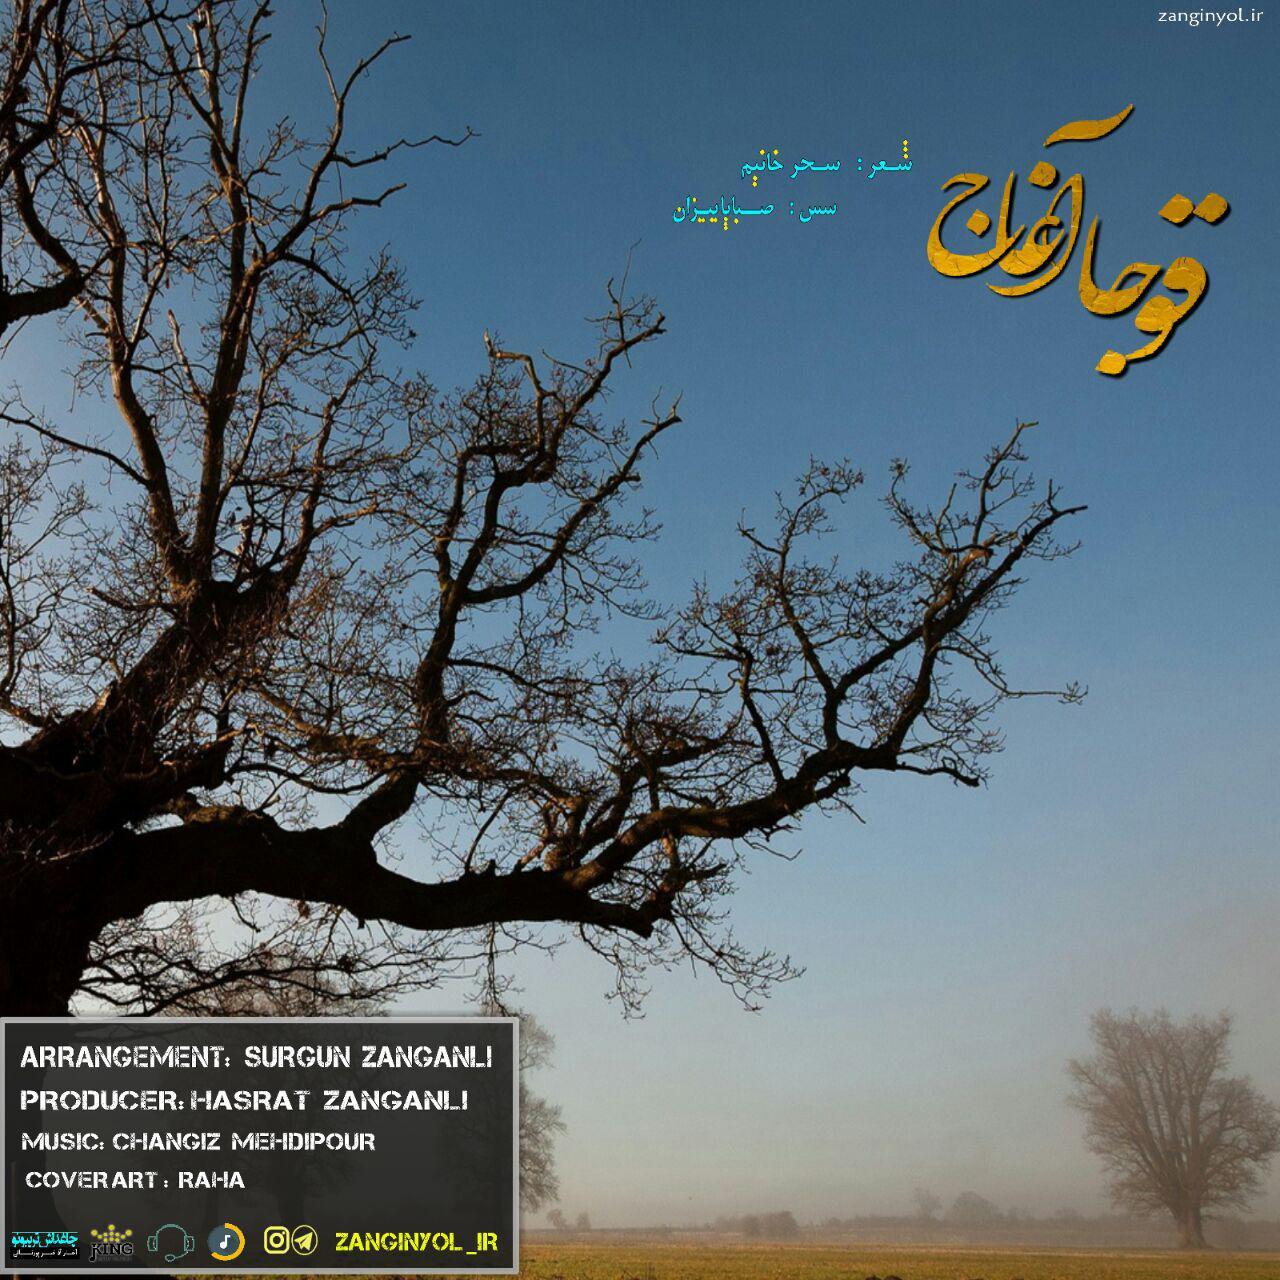 http://s8.picofile.com/file/8334260250/29Saba_Payizan_Qoca_Agac.jpg